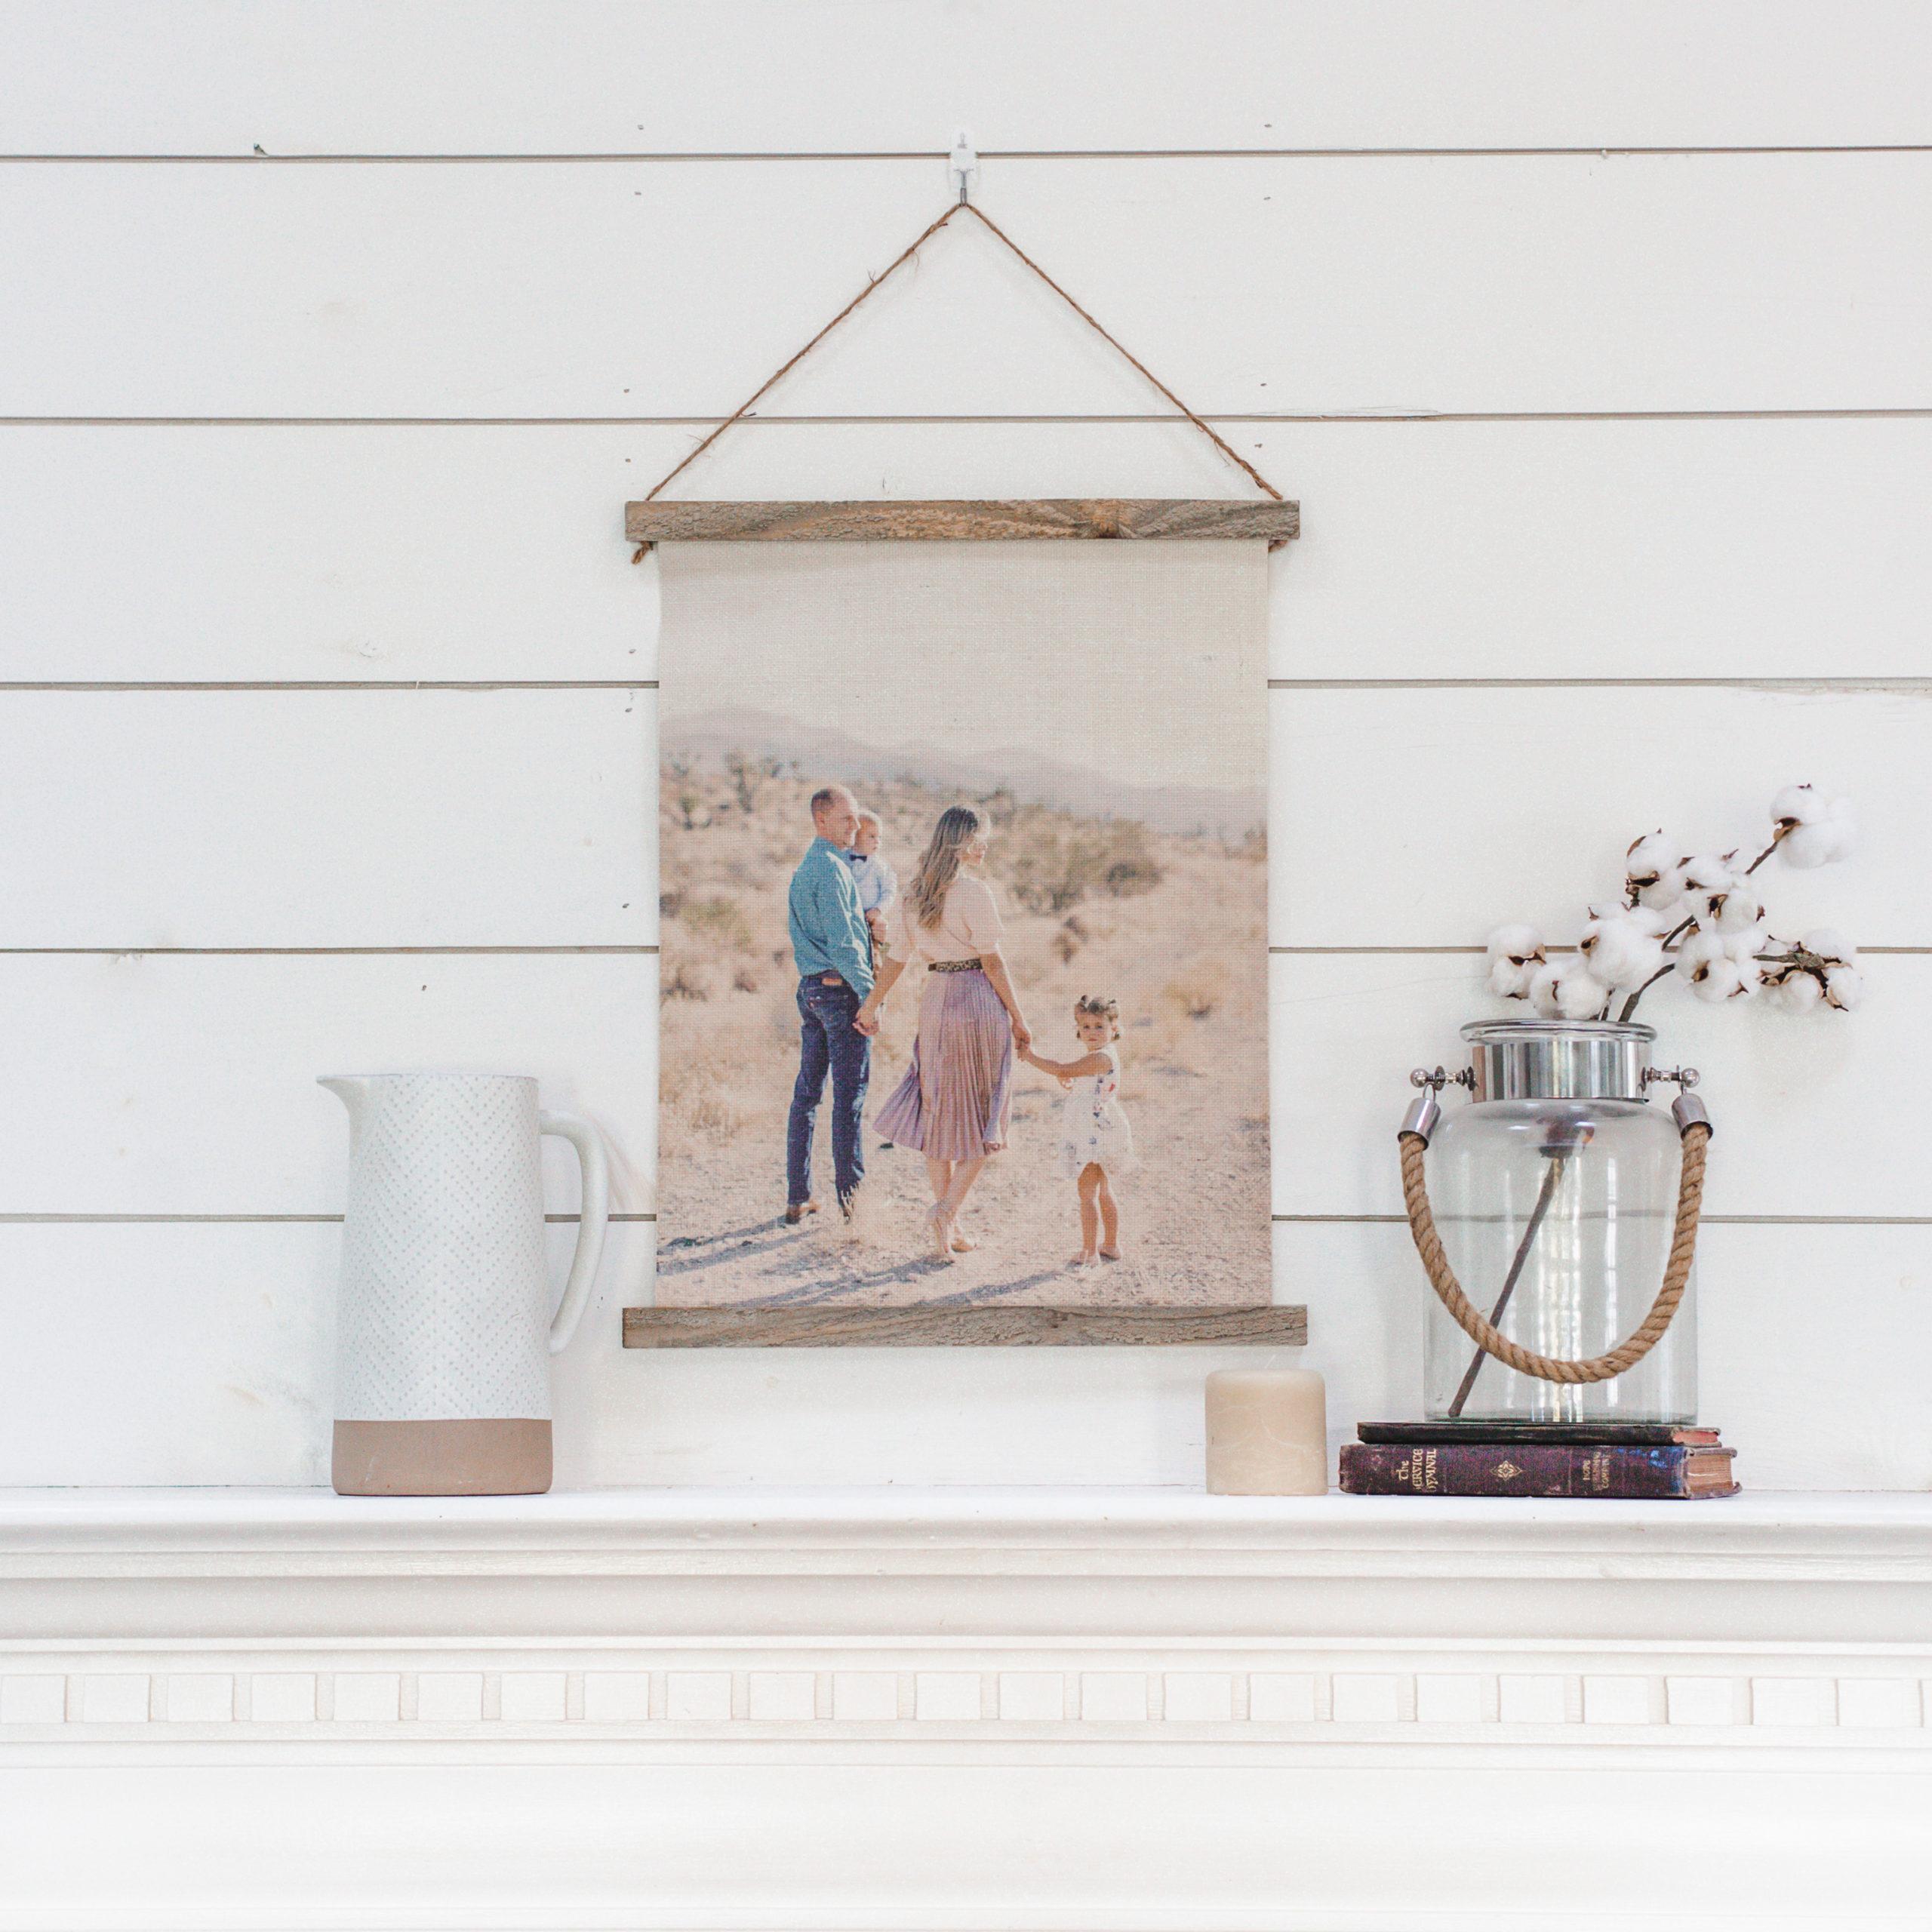 16x20 Hanging Burlap Prints | $29 ($135)